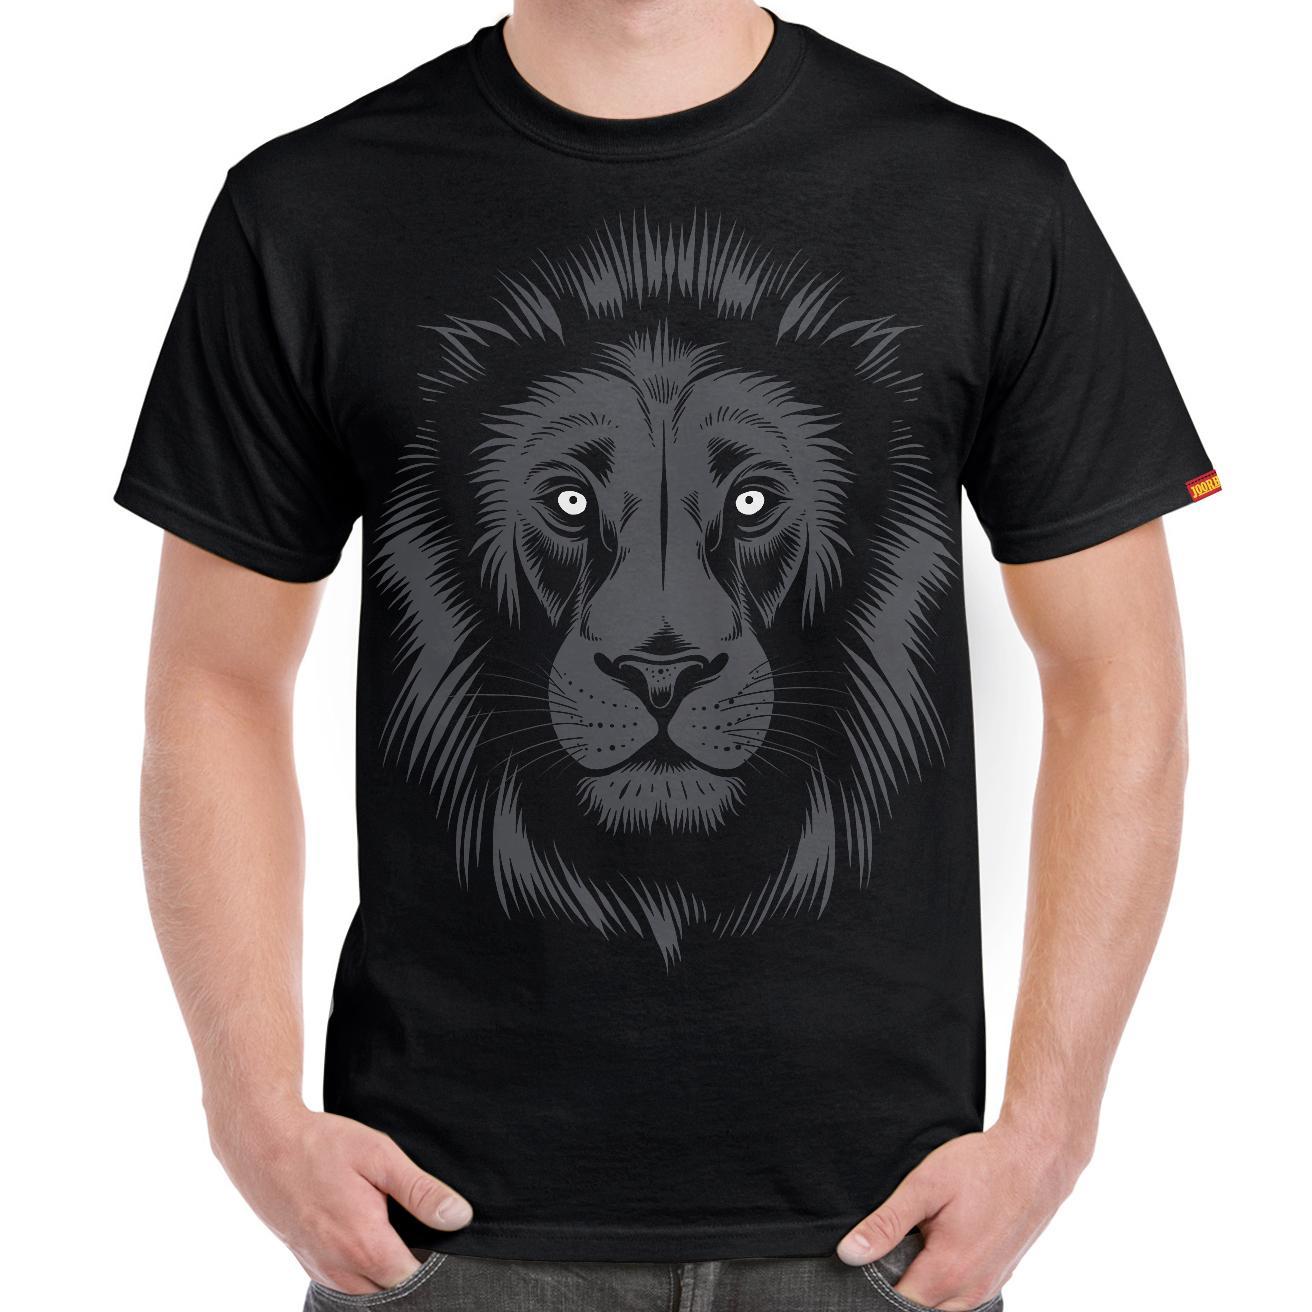 80e59c4fa86 T-Shirt Clothing for Men for sale - Mens Shirt Clothing online ...